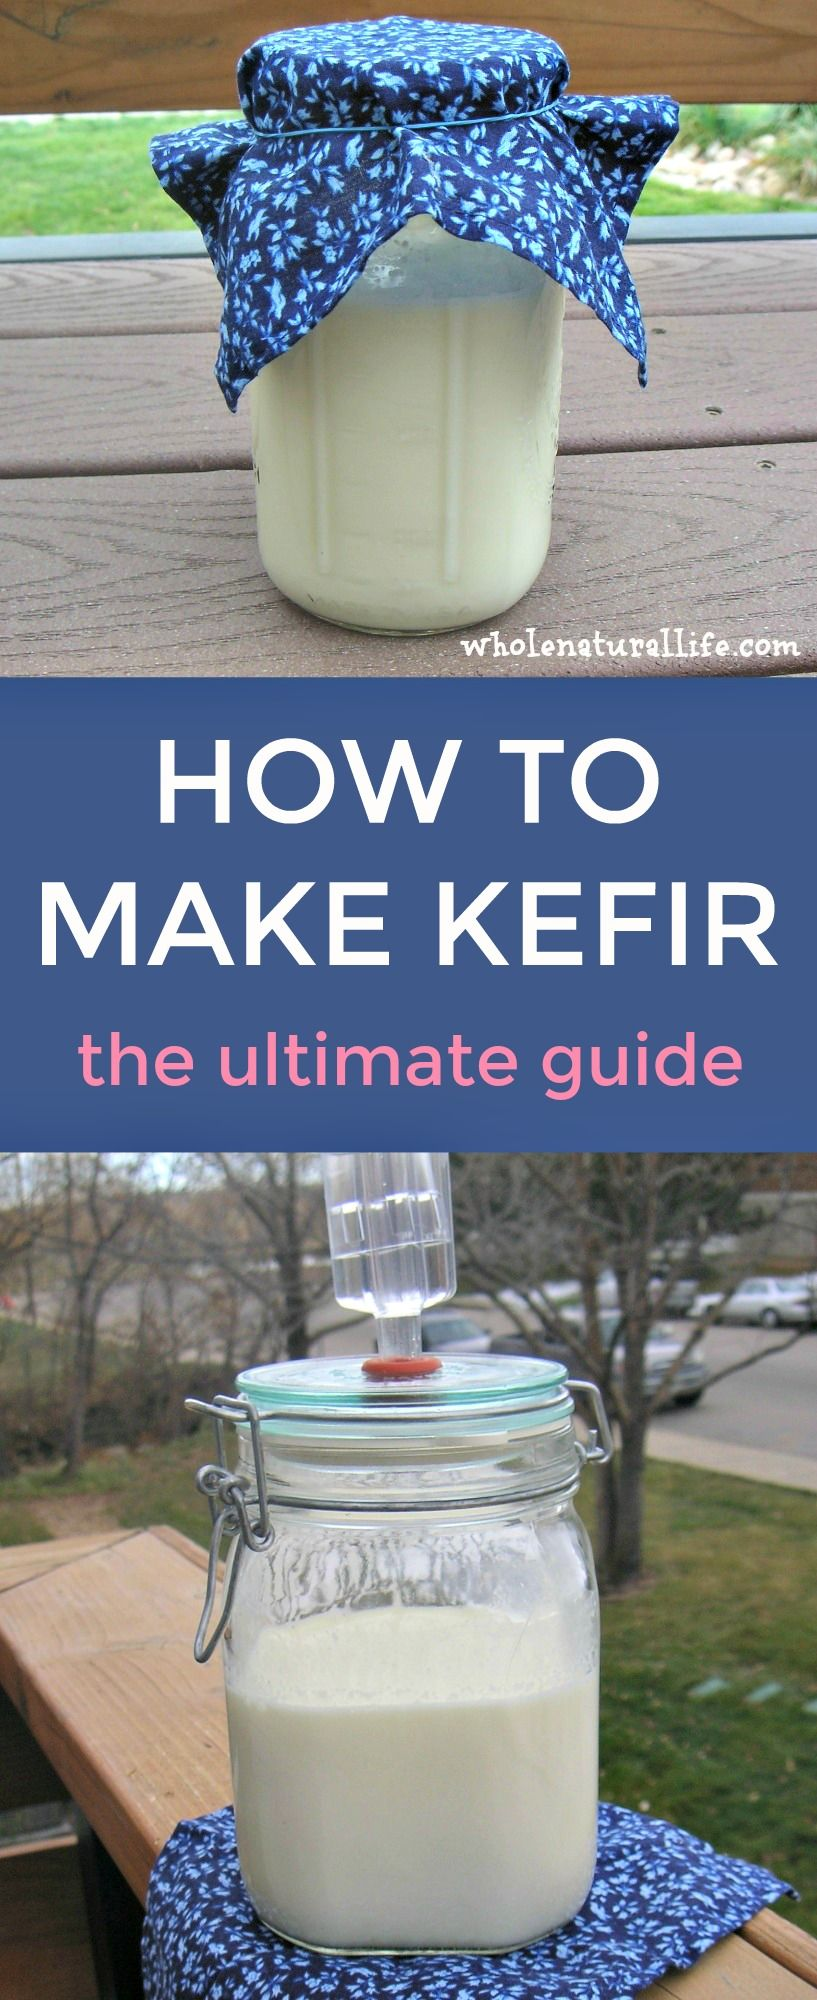 How to Make Kefir Recipe Kefir how to make, Kefir